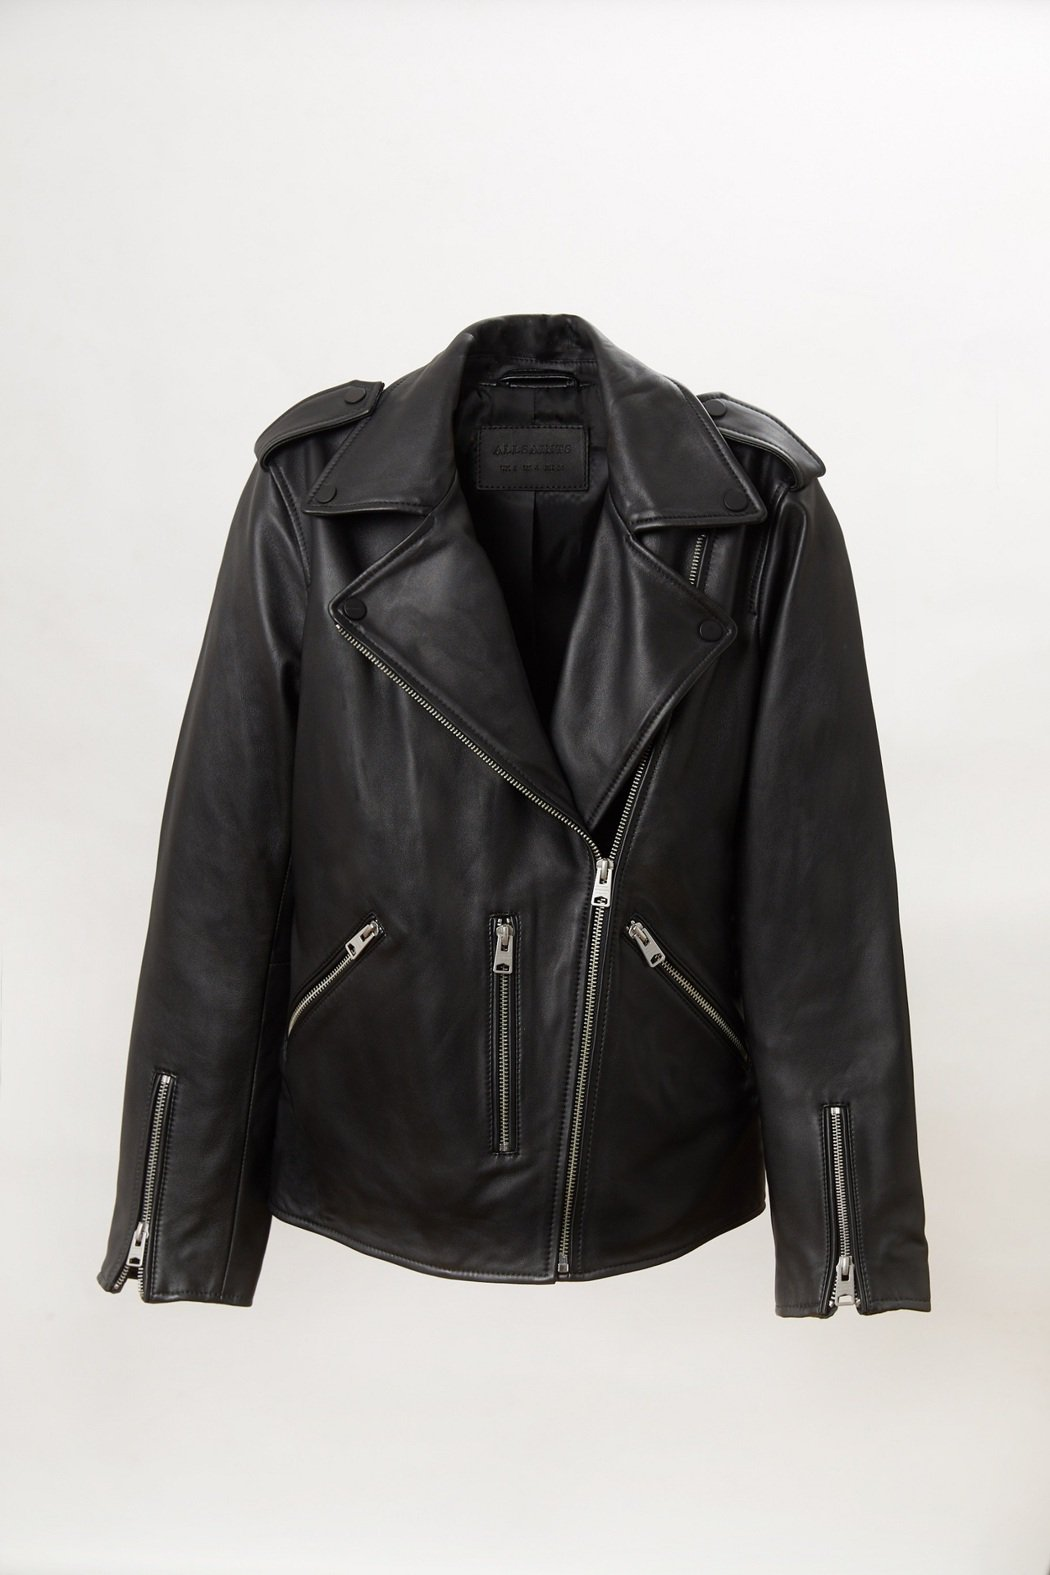 ALLSAINTS Bailey亞洲限定限量簡約騎士皮夾克原價21,300元,特...